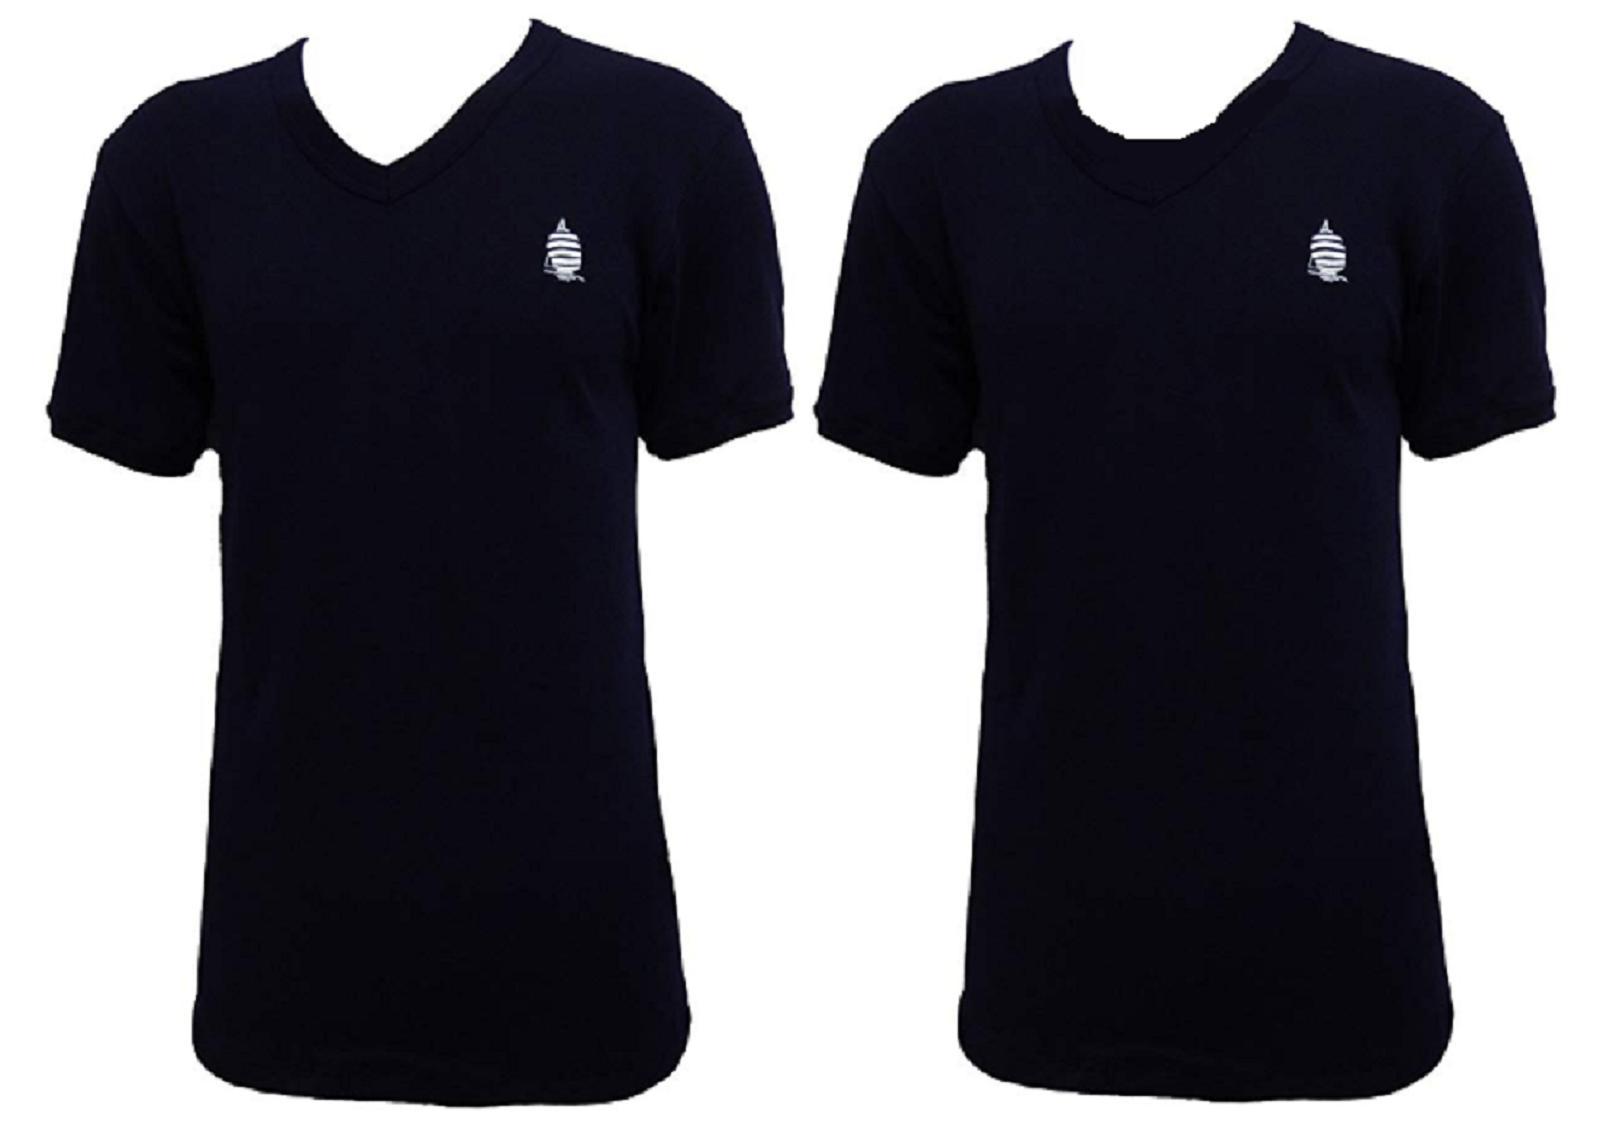 T-Shirt Maglietta Caldo Cotone mezza Manica corta Uomo MARINA YATCHING Intimo